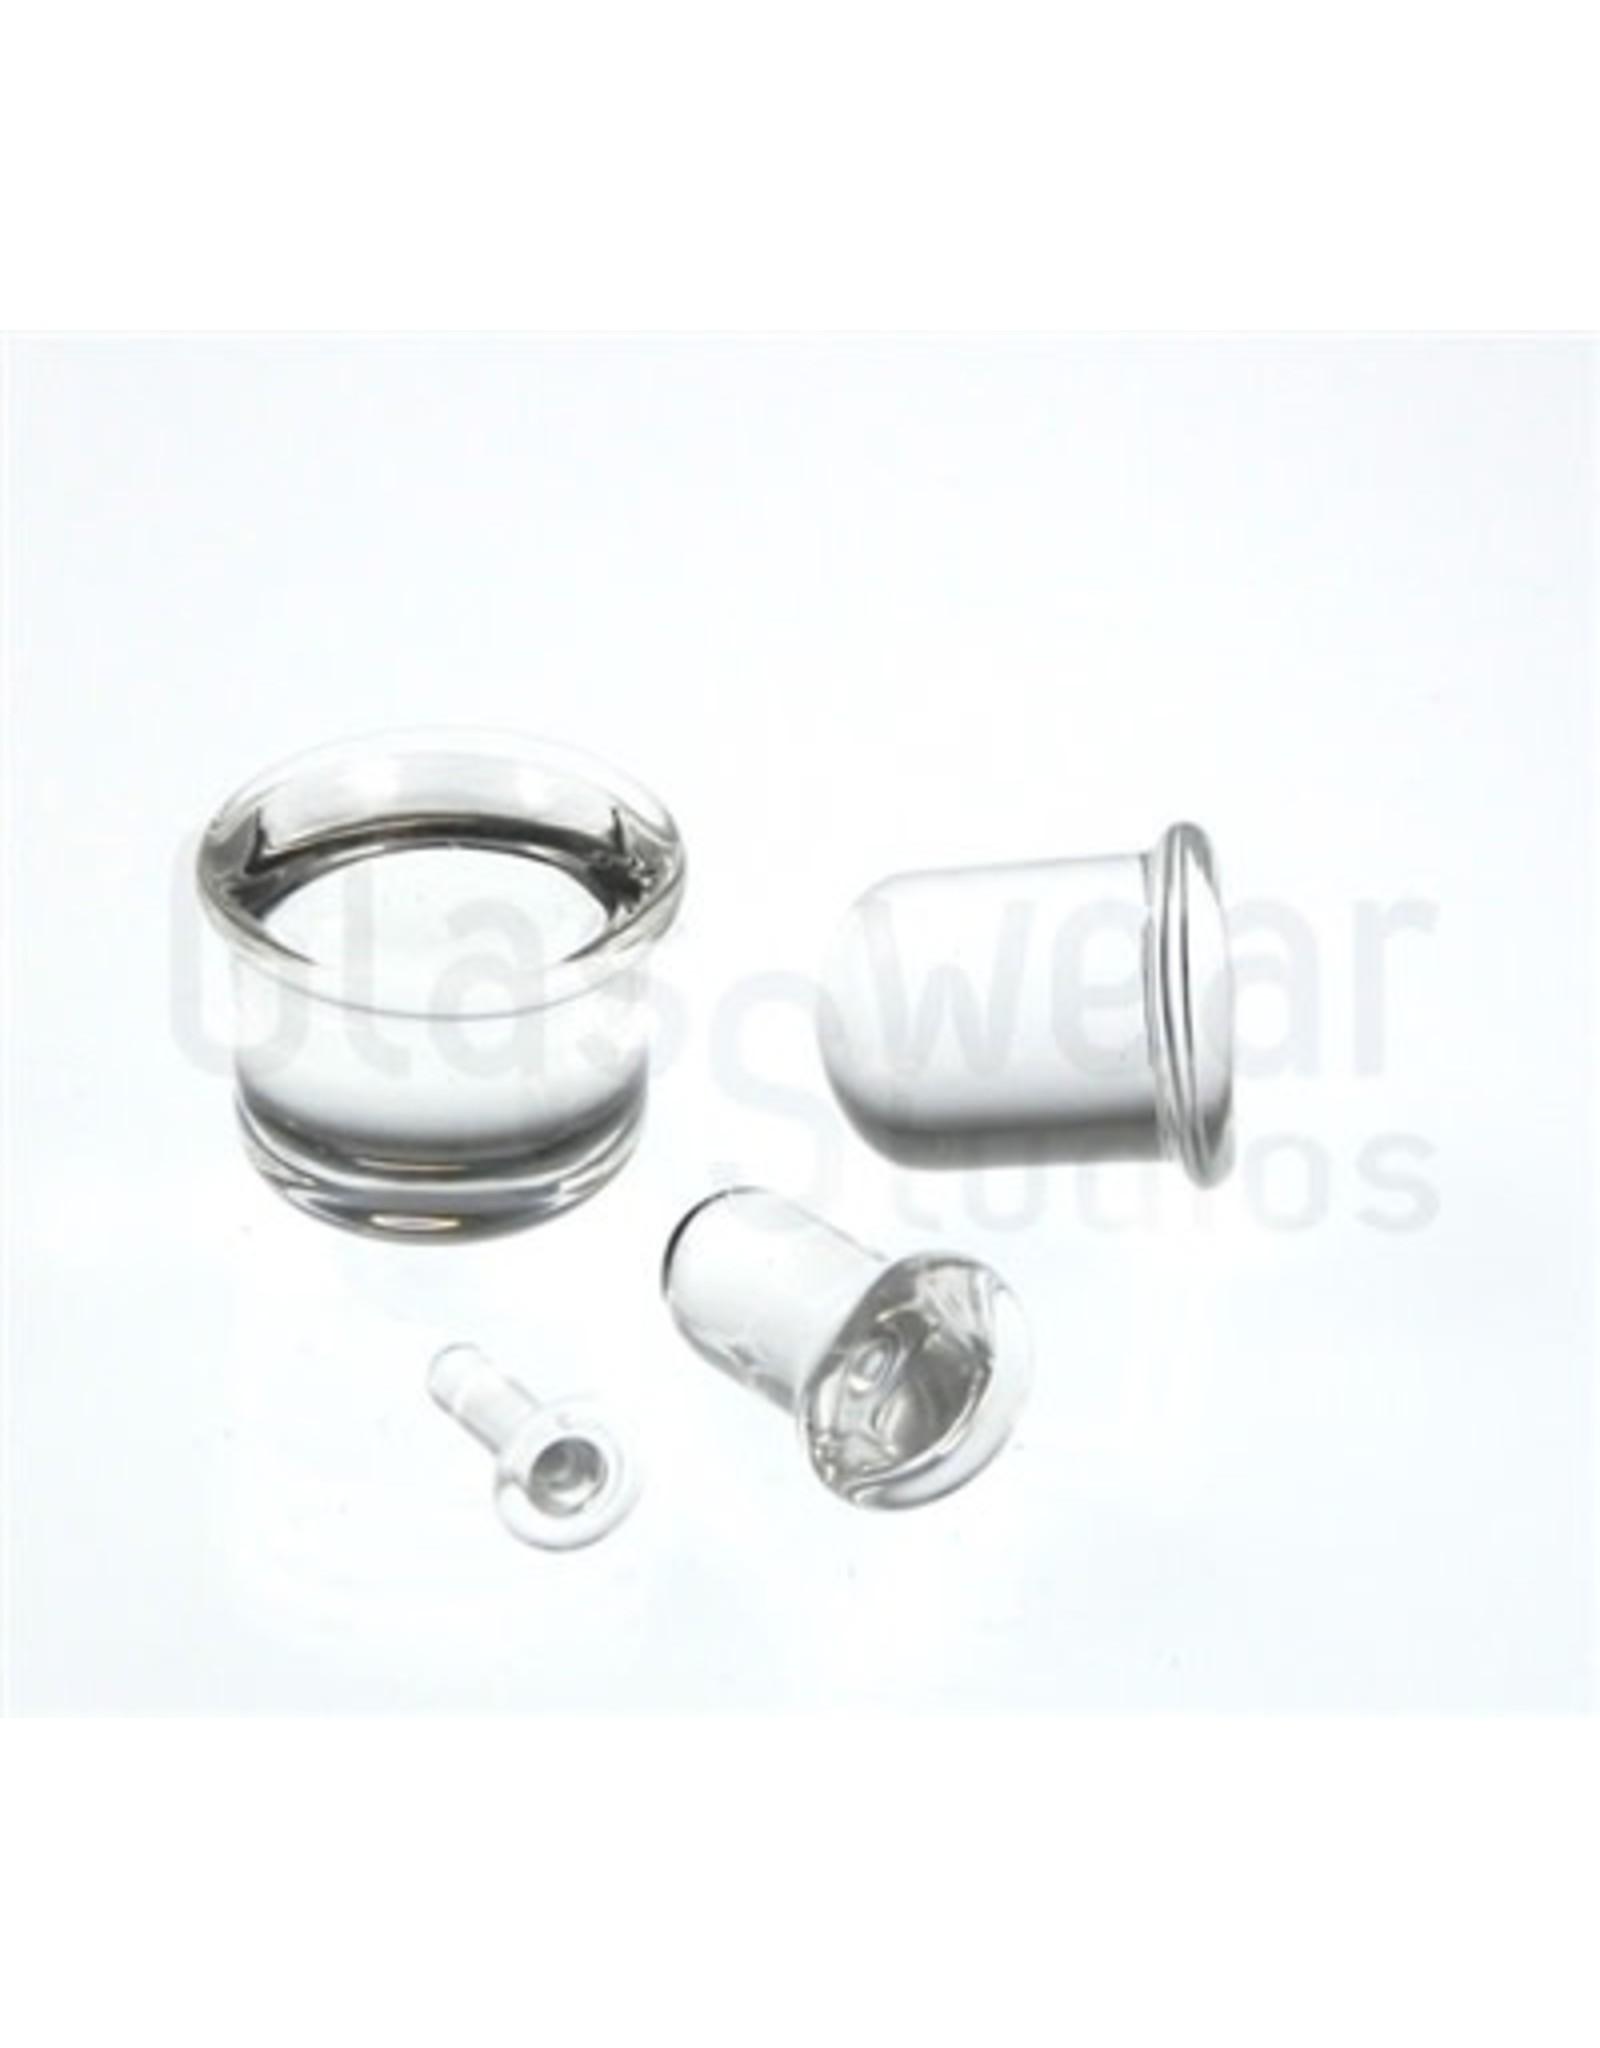 6g SF Glass Plugs